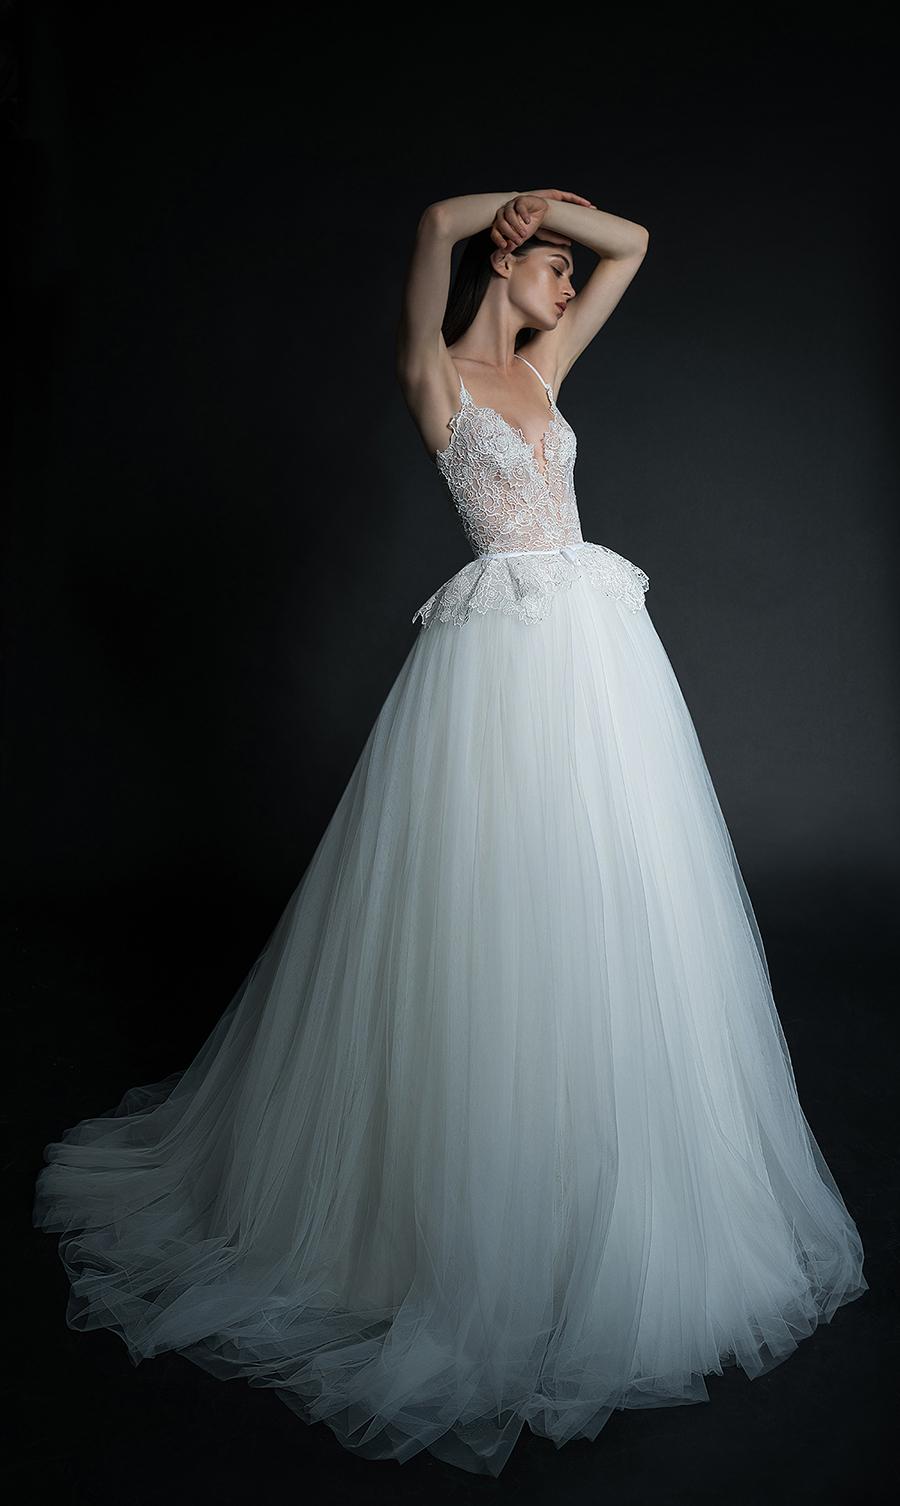 Famous Wedding Dress Shops Walsall Illustration - Wedding Dress ...